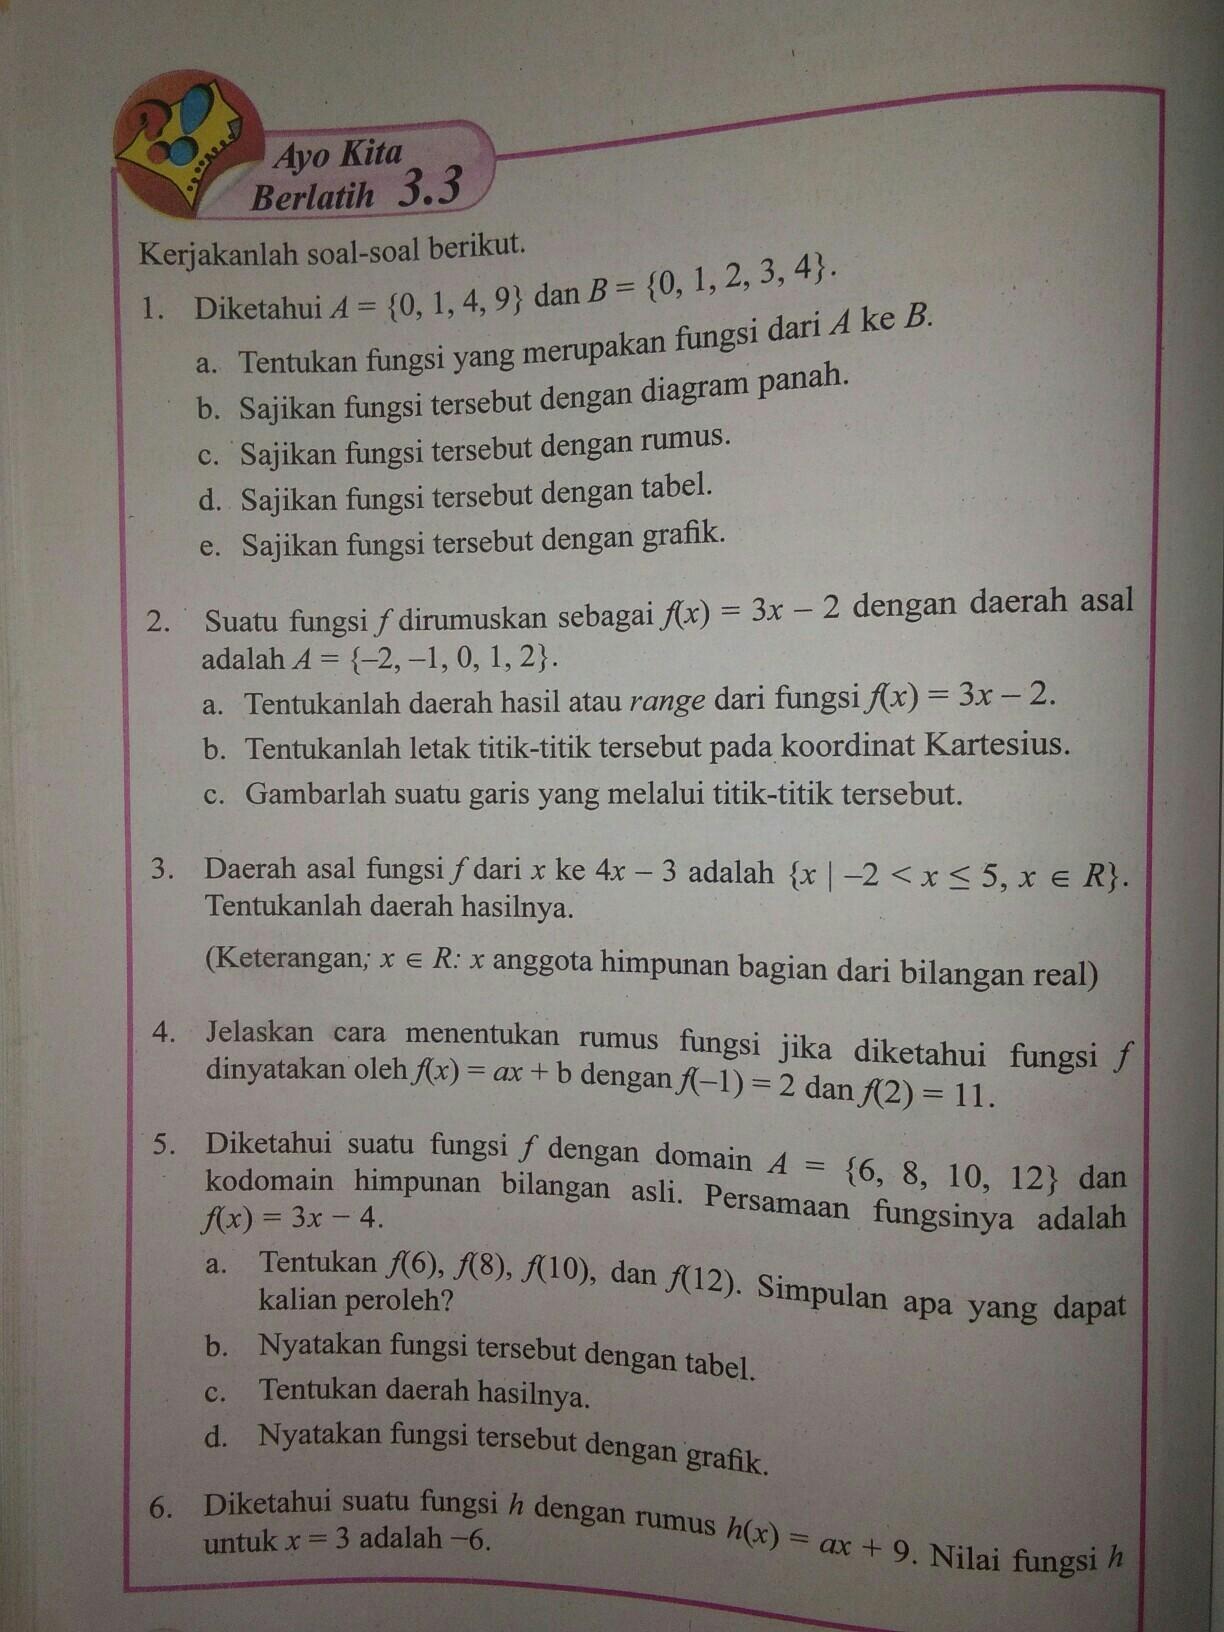 Jawaban Matematika Ayo Kita Berlatih 3 3 Halaman 114 Kelas 8 Brainly Co Id